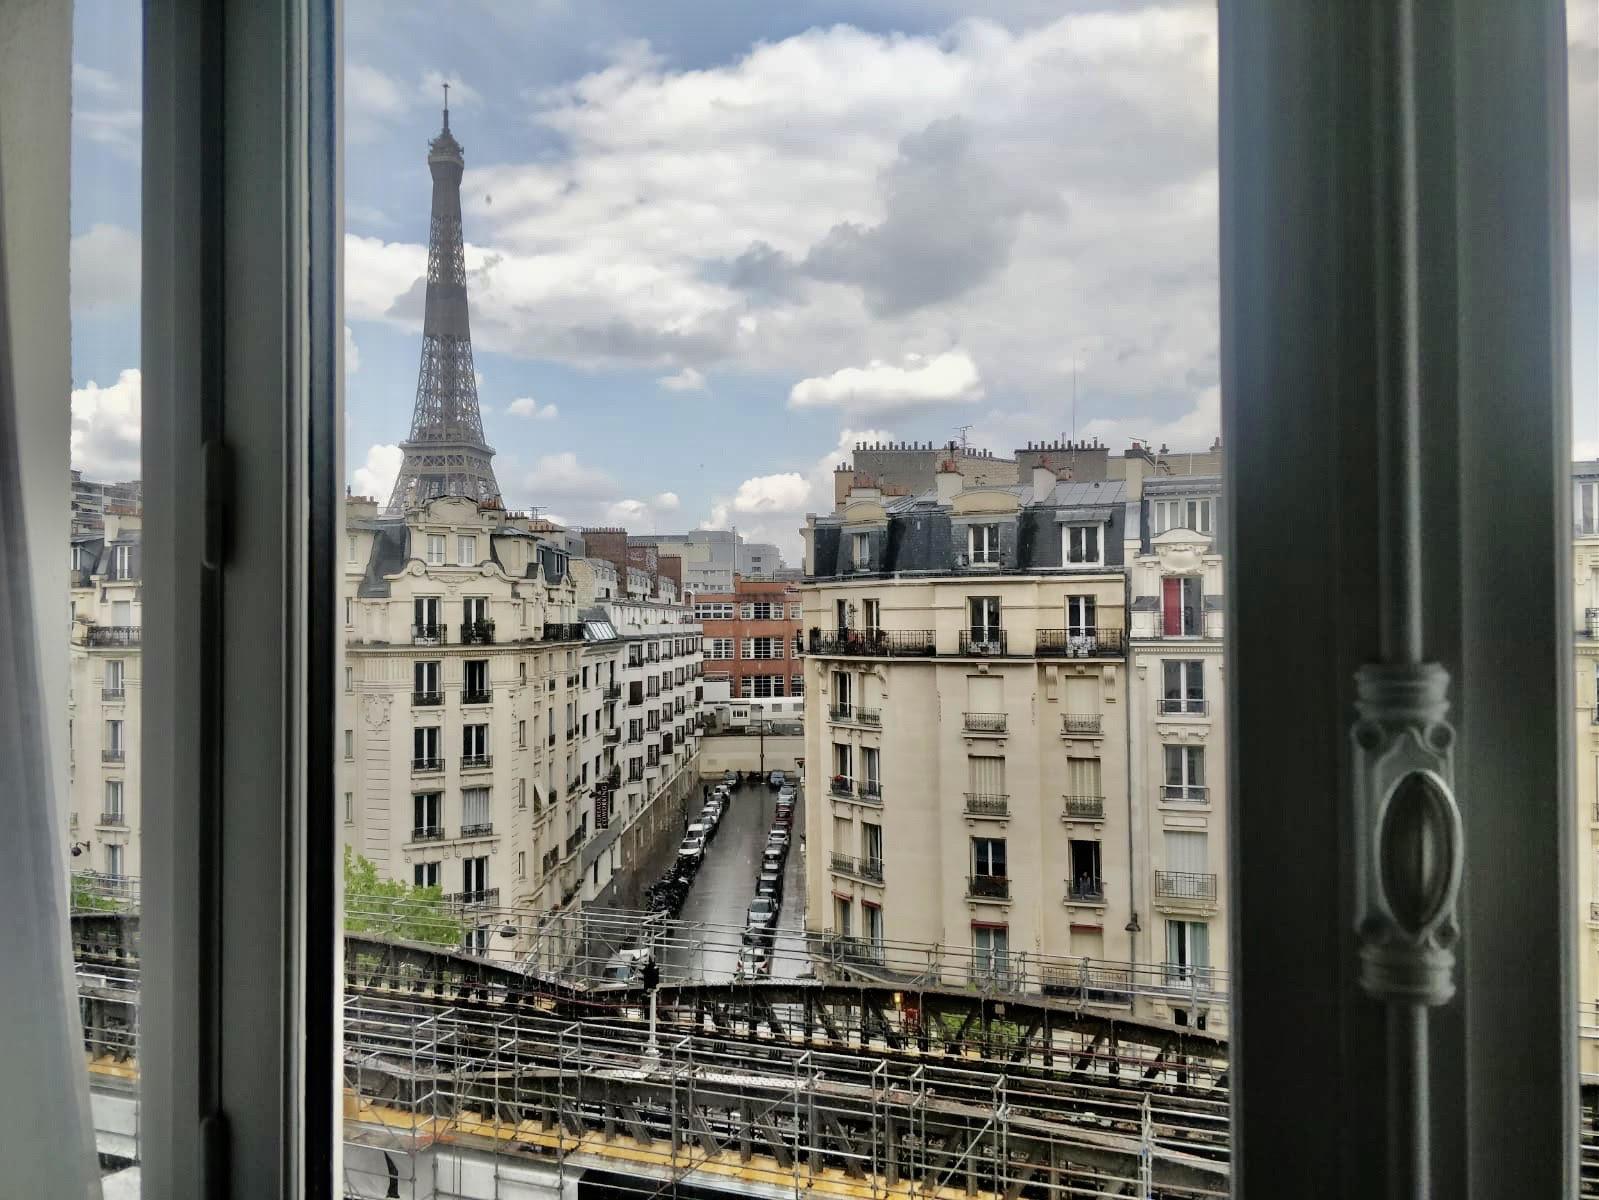 Продажа квартиры - 75015, 74m2, вид на Эйфелеву башню